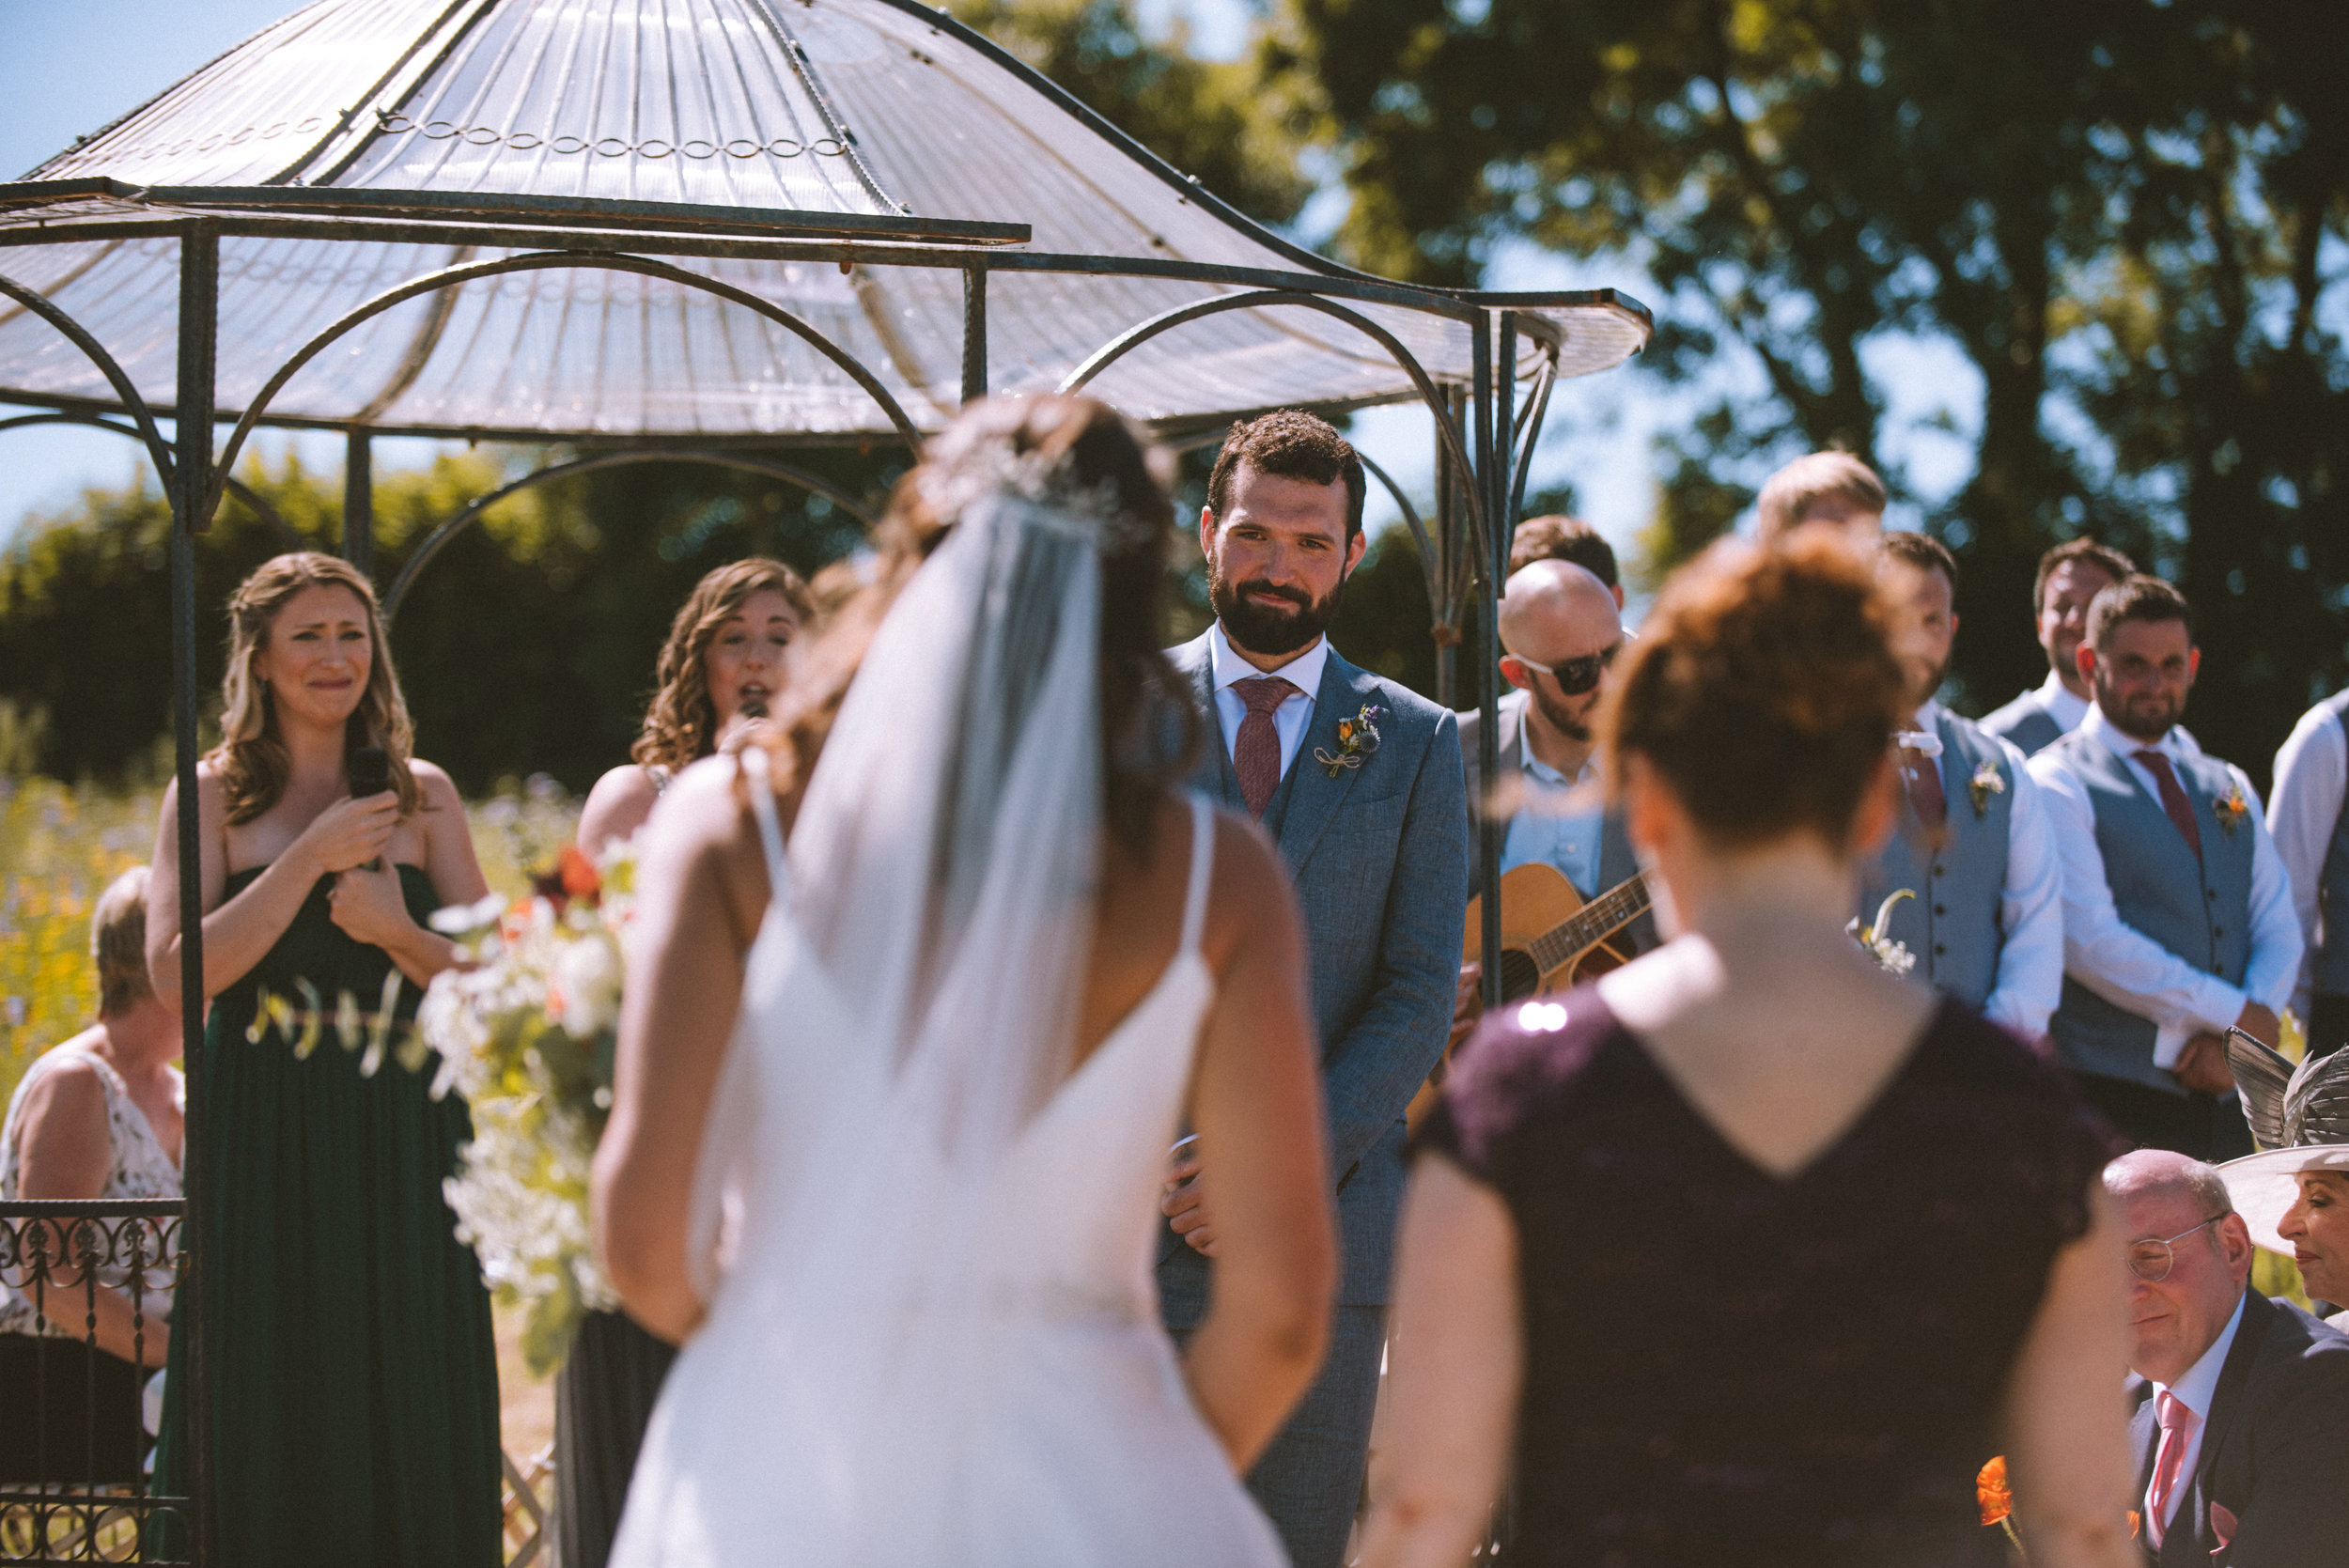 ash-barton-estate-wedding-photographer-mark-shaw-23.jpg